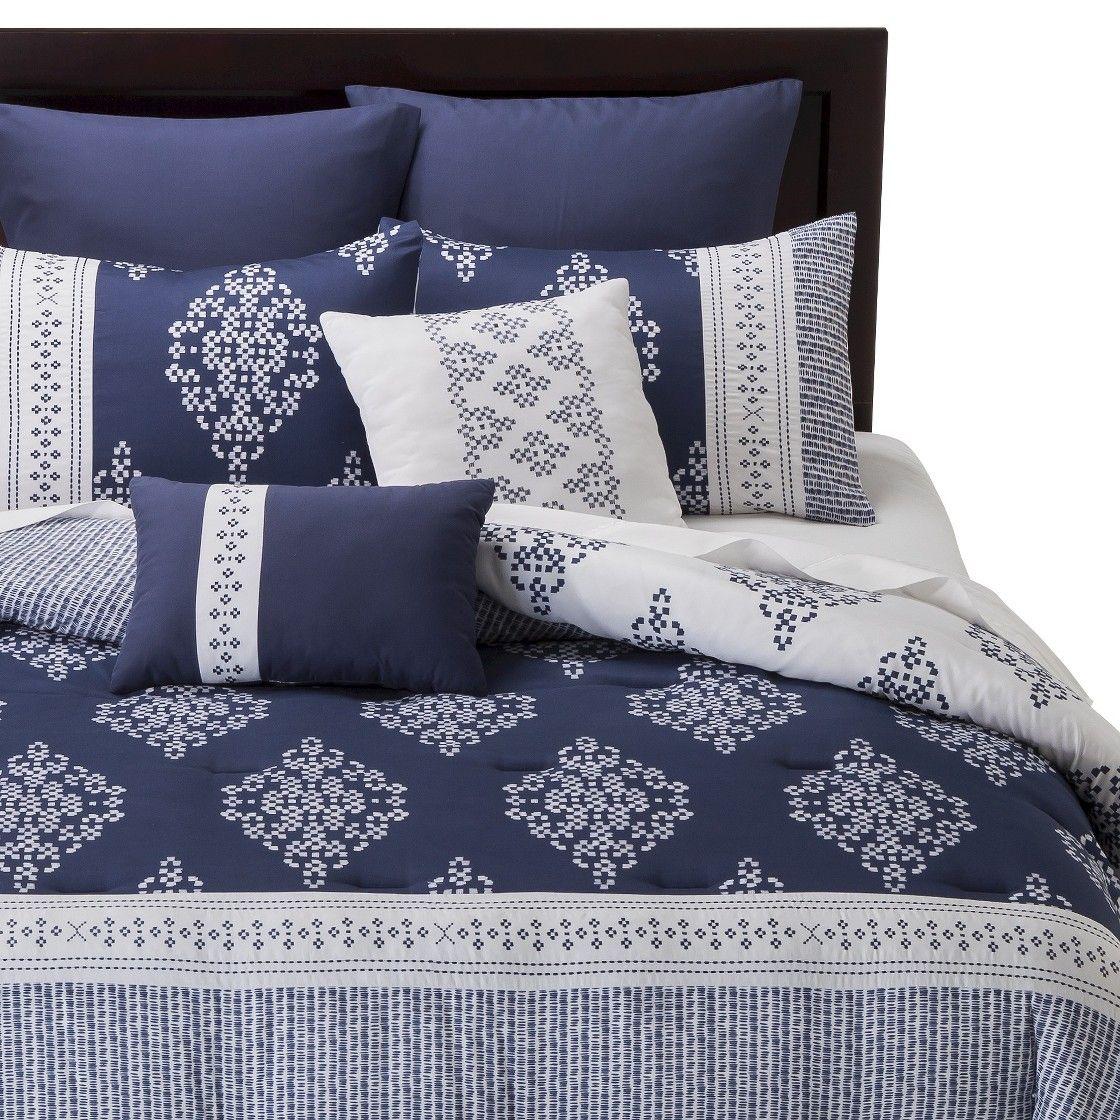 Triple Tap To Zoom In Blue Comforter Sets Comforter